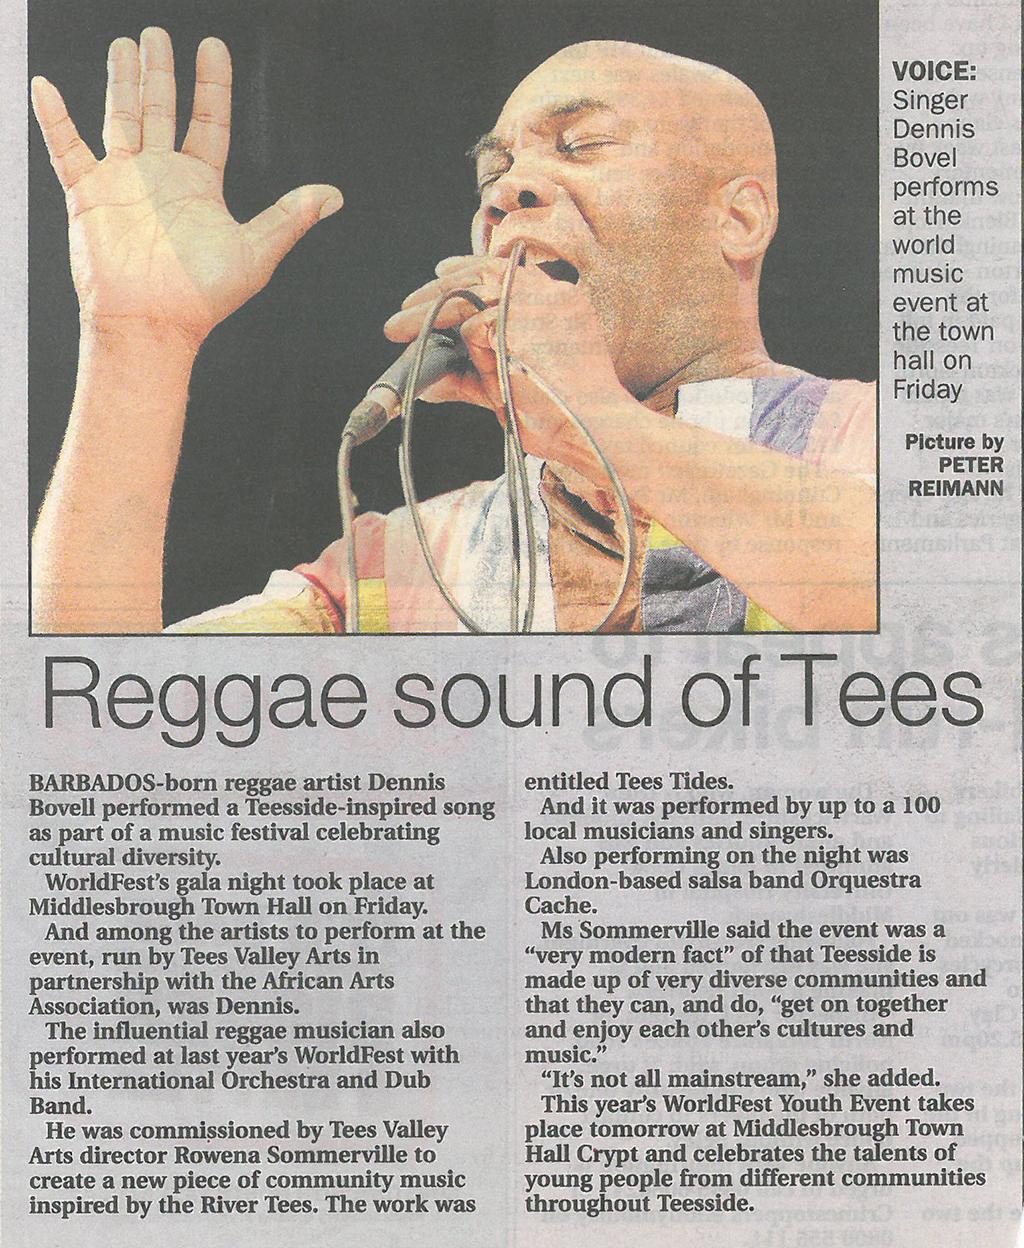 2011-06-06, Evening Gazette